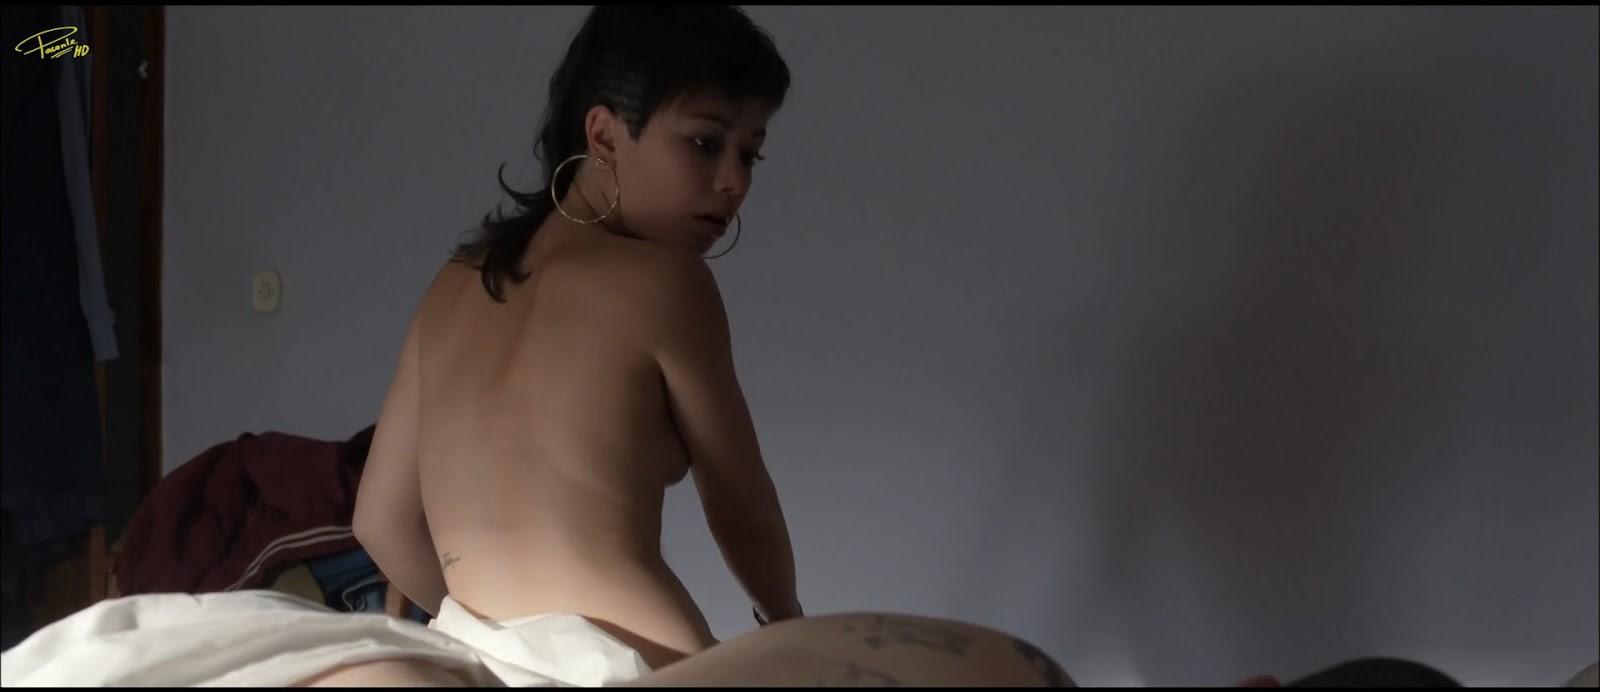 Kate Del Castillo Nude Naked